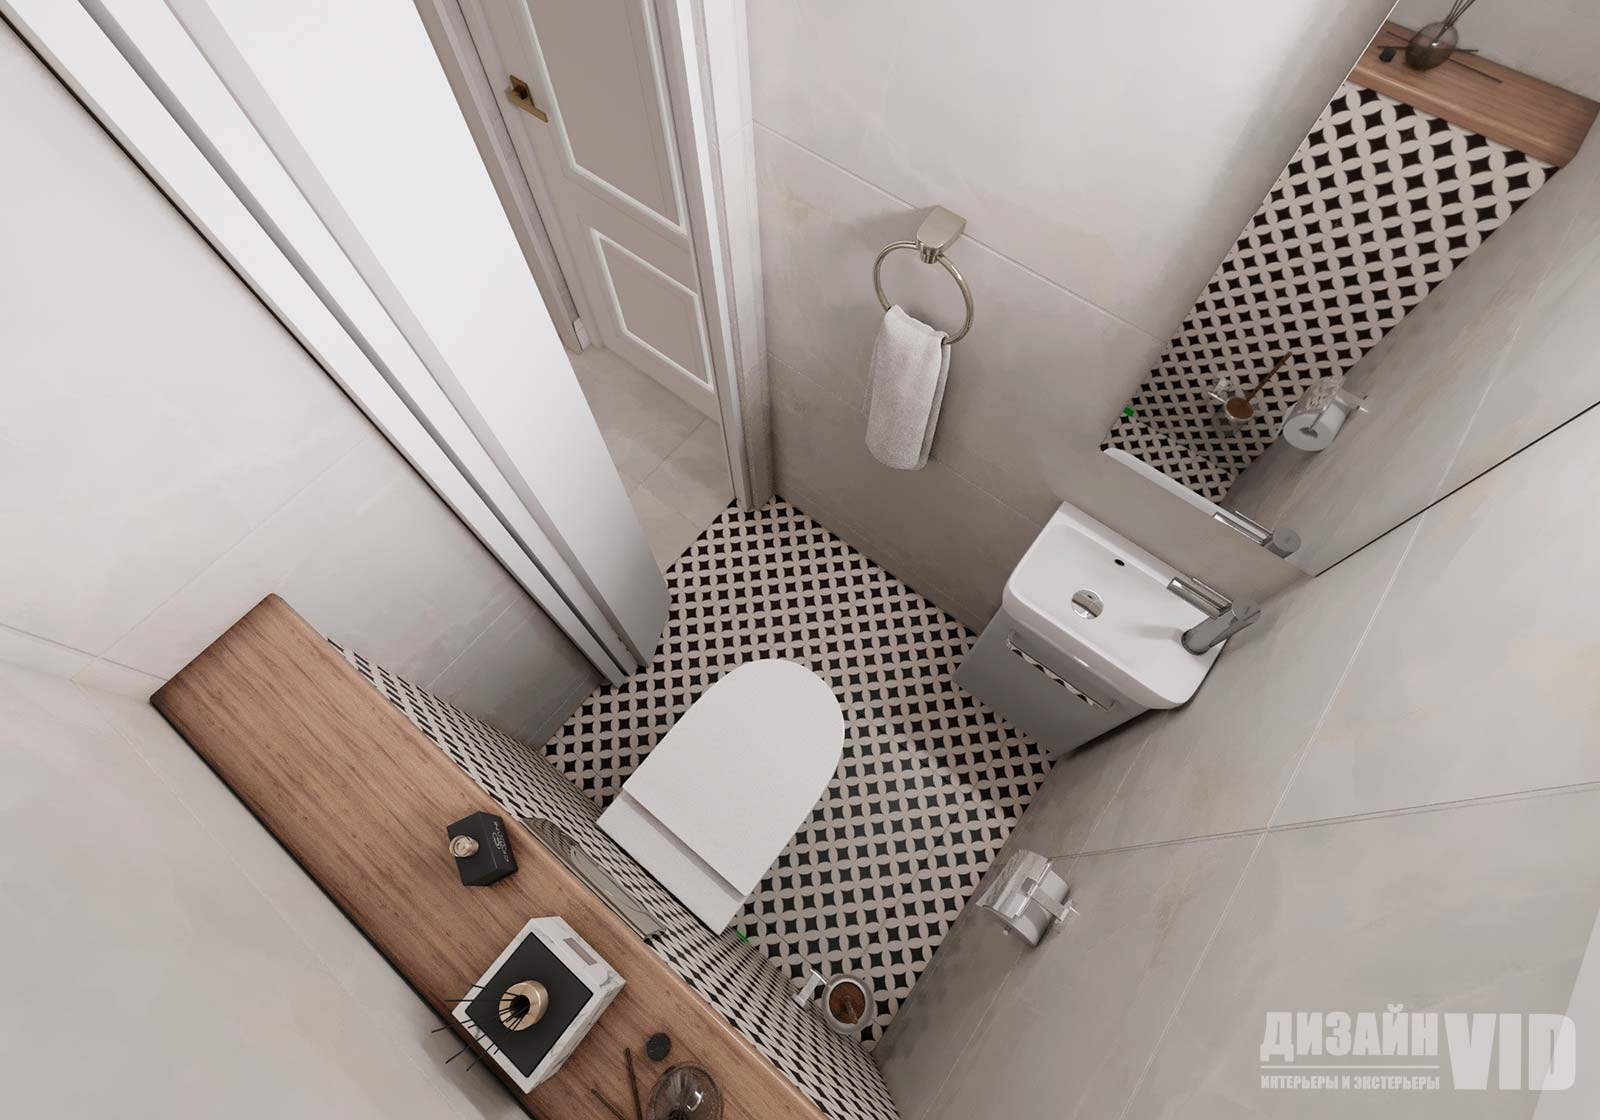 инсталляция в туалетной комнате